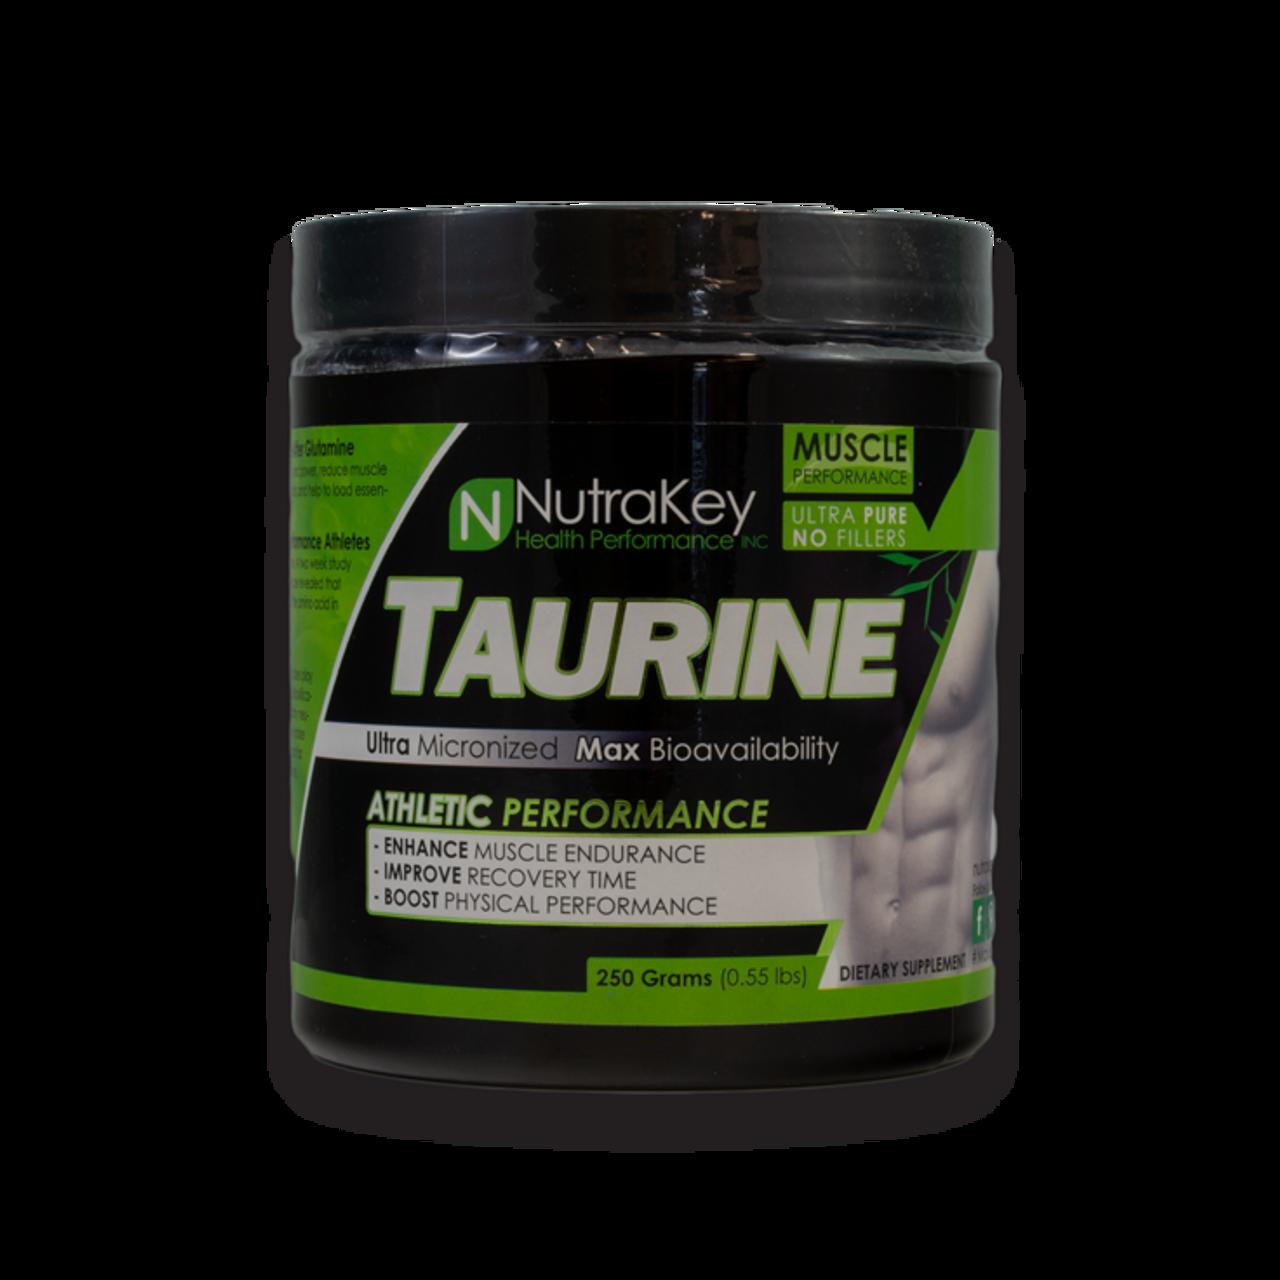 Nutrakey Taurine 250 serving